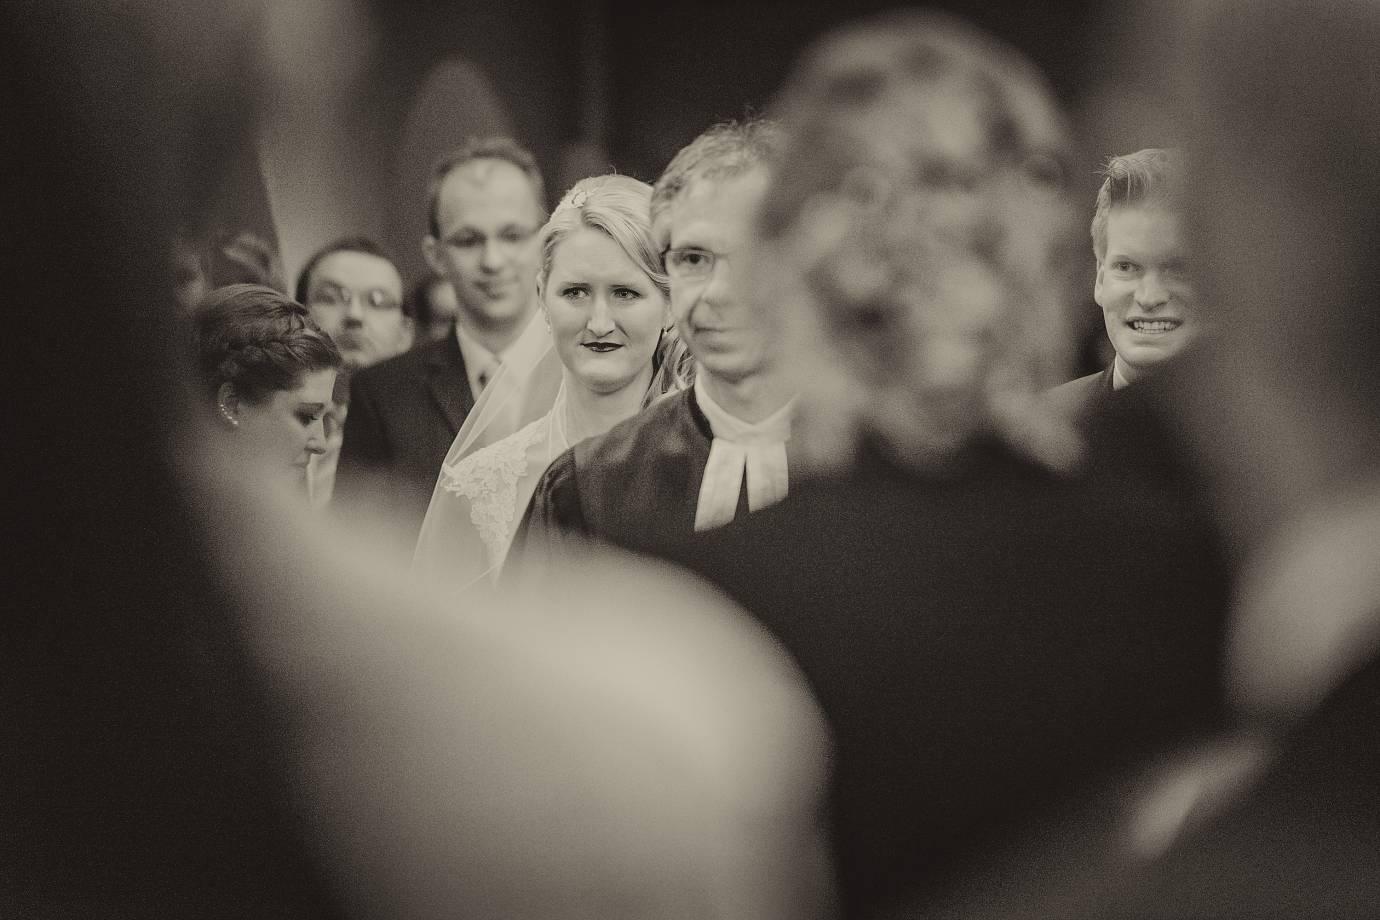 hochzeitsfotograf zeven 050 - Susann+Sören